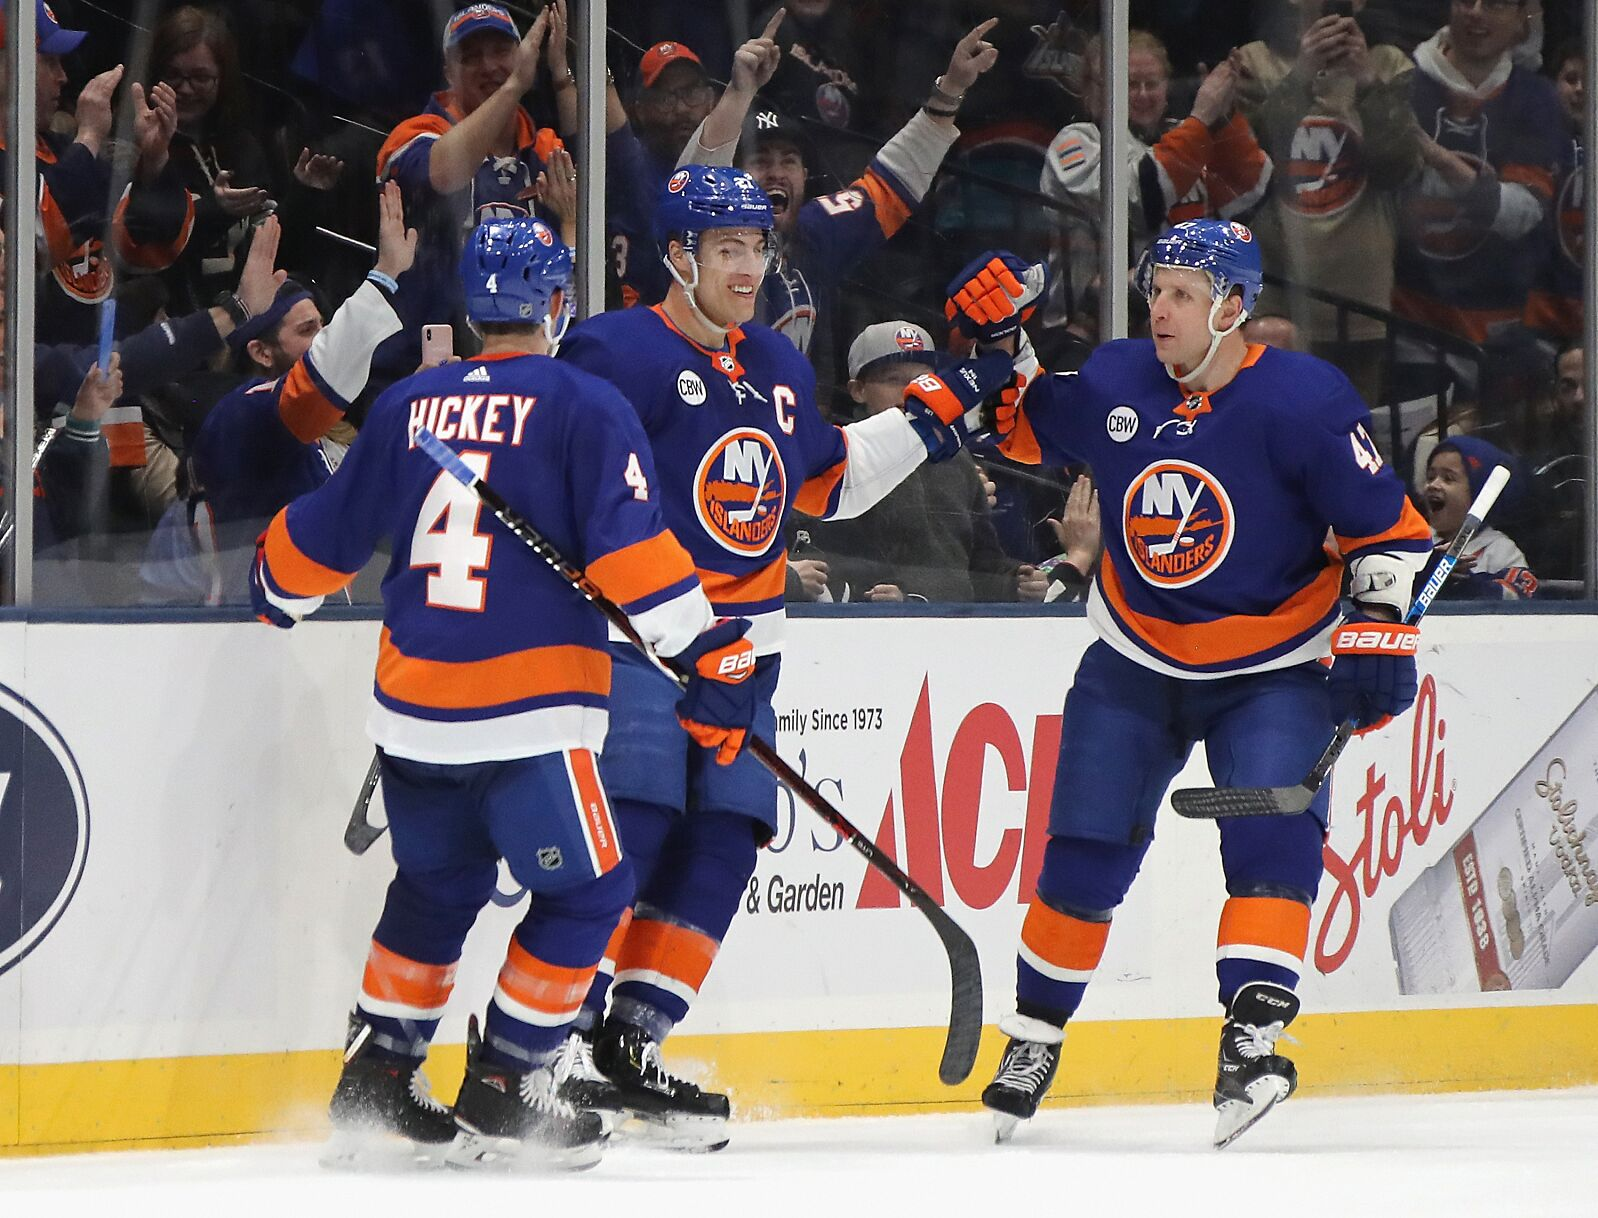 New York Islanders Tickets & Schedule 2019 | The Ultimate ...